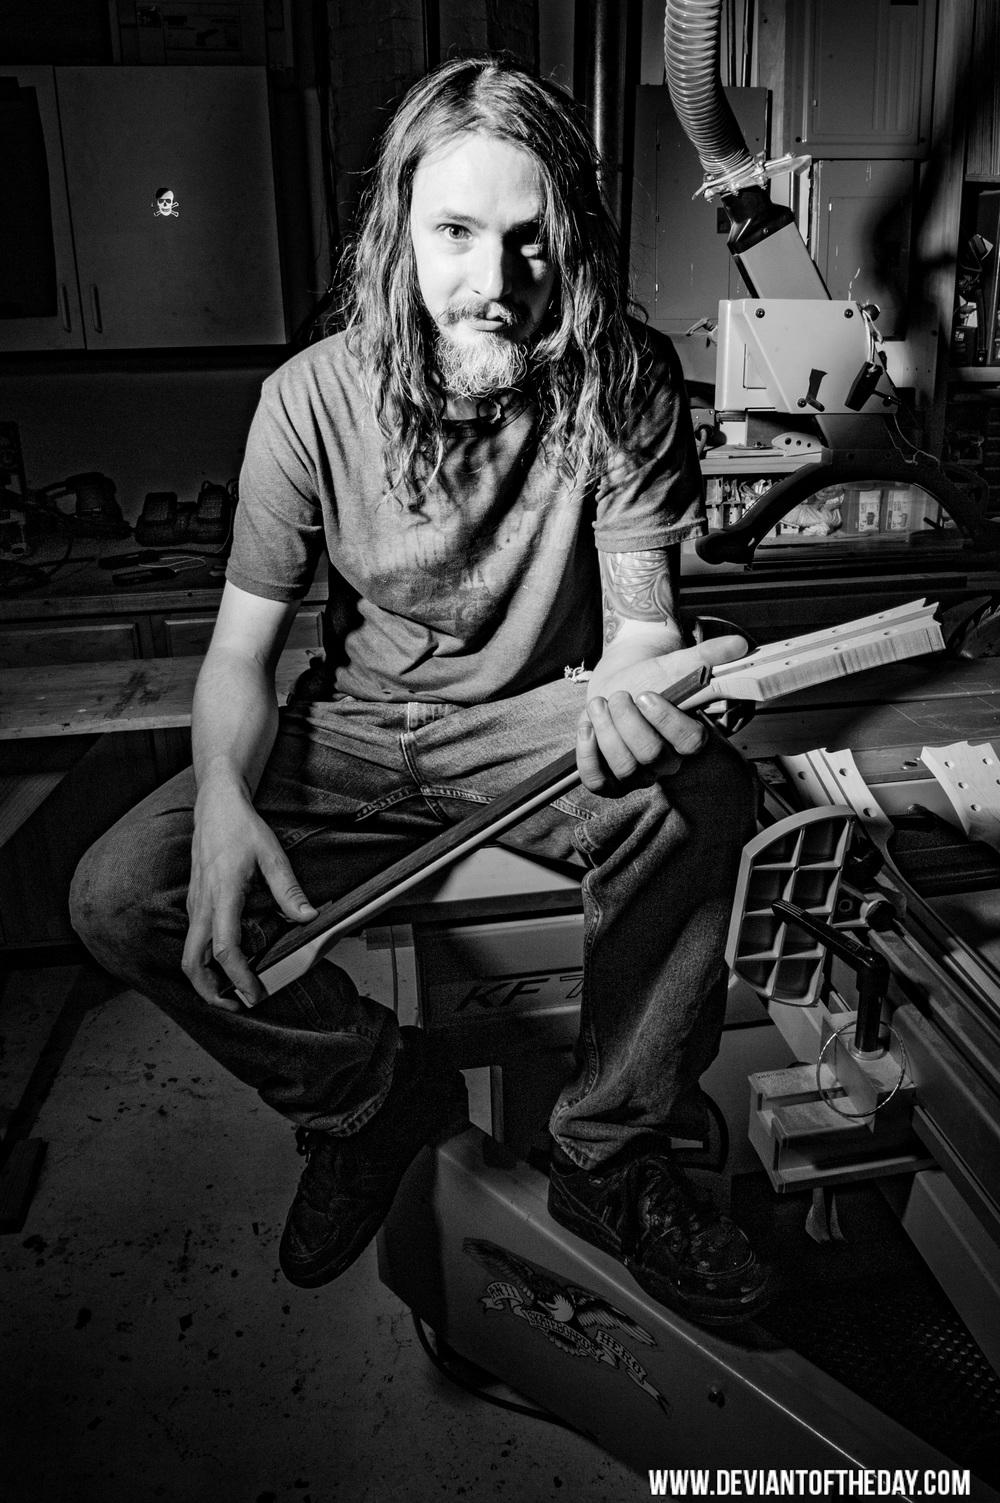 jonathan-mcphail-photography-bk-portraits-headshots-deviant-day-markus-shaffer.jpg